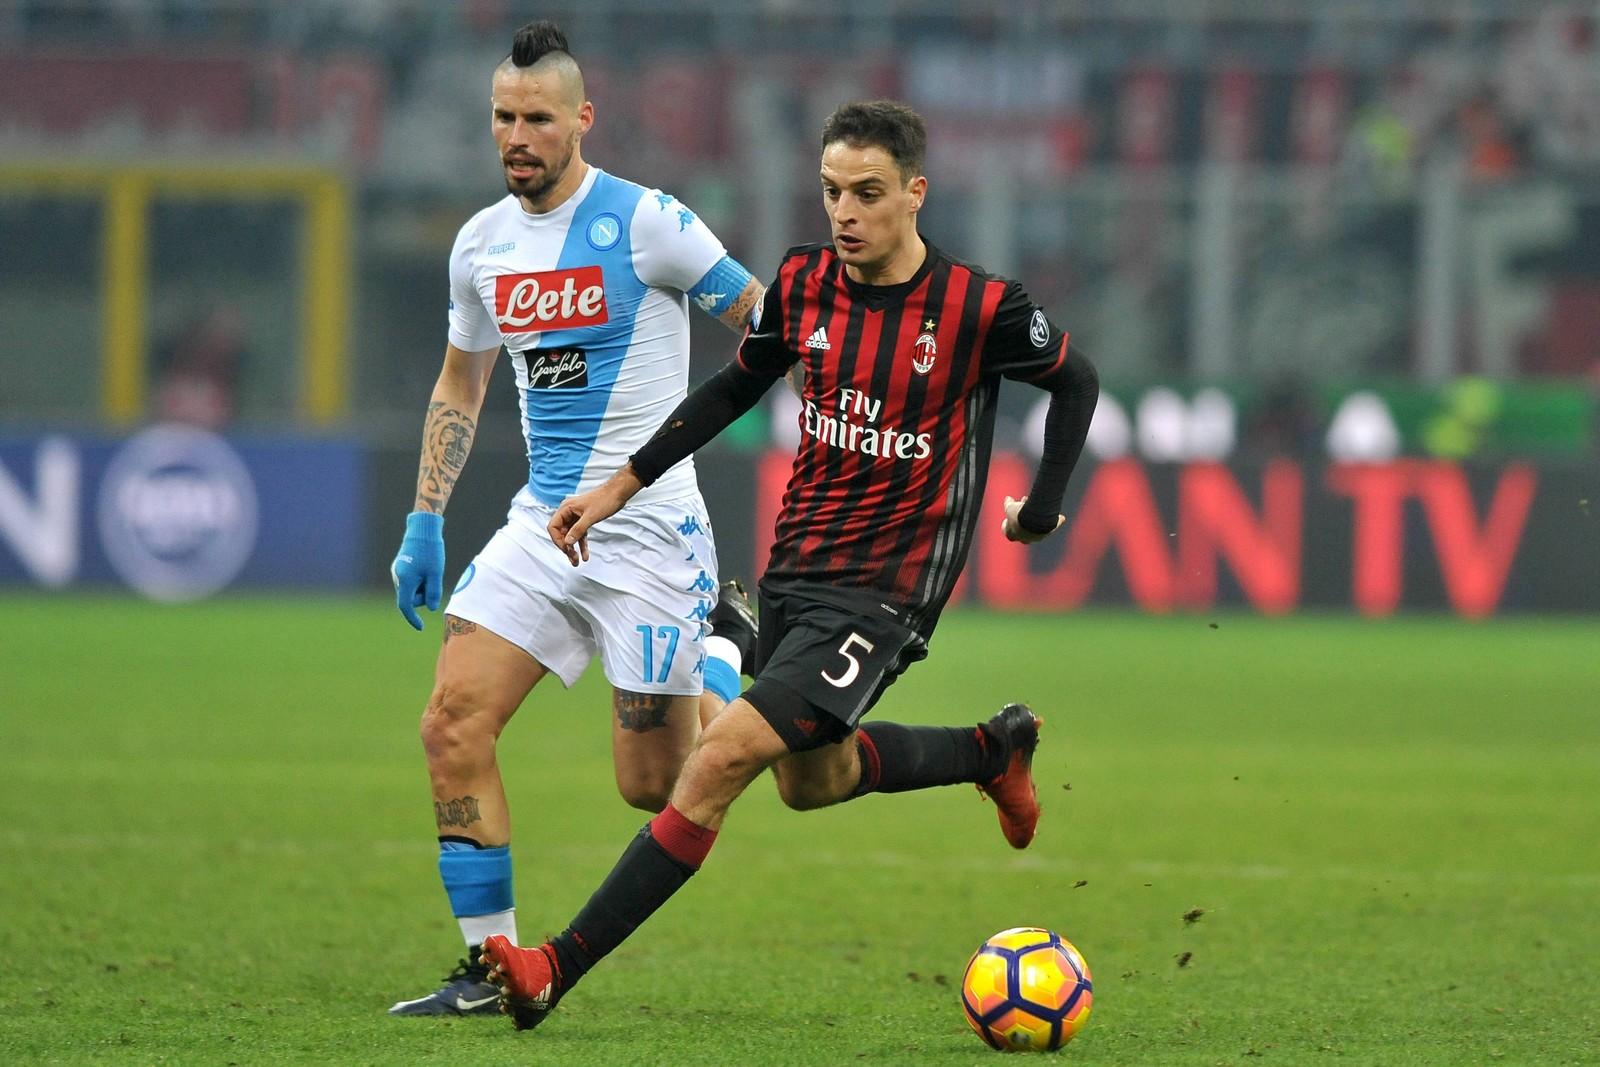 Giacomo Bonaventura vom AC Milan gegen Marek Hamsik vom SSC Neapel